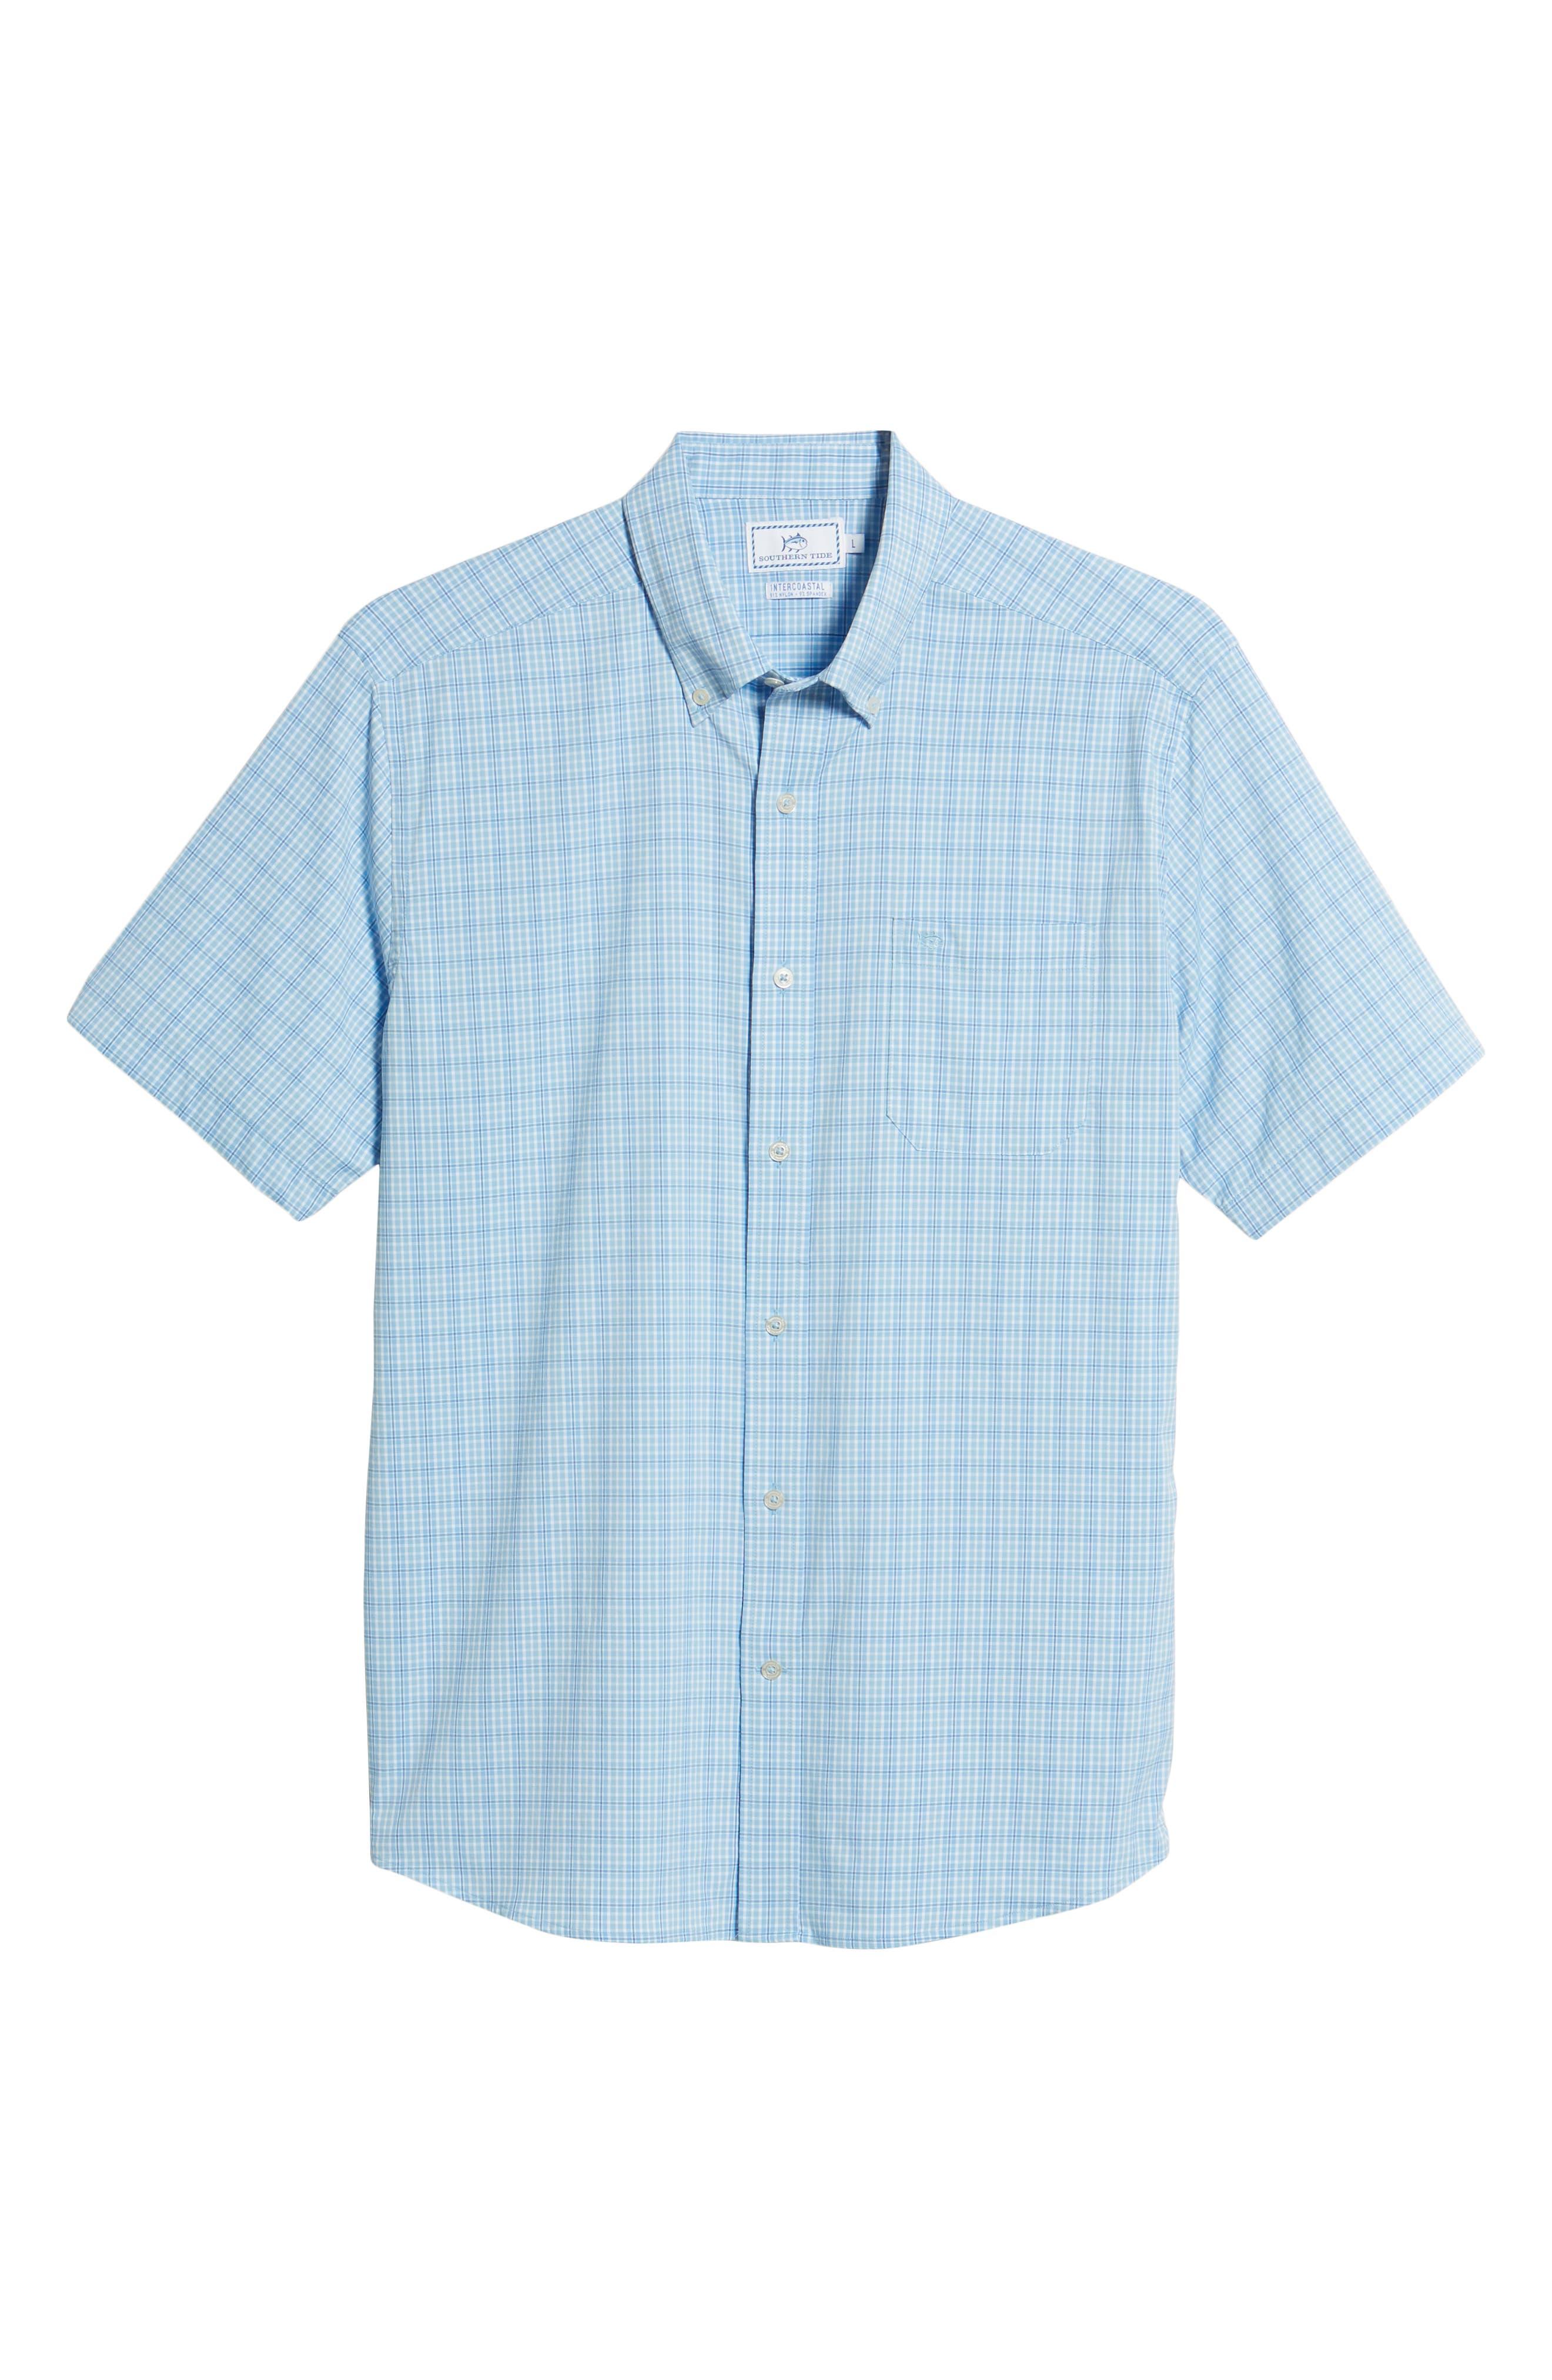 Nautical Mile Regular Fit Plaid Performance Sport Shirt,                             Alternate thumbnail 11, color,